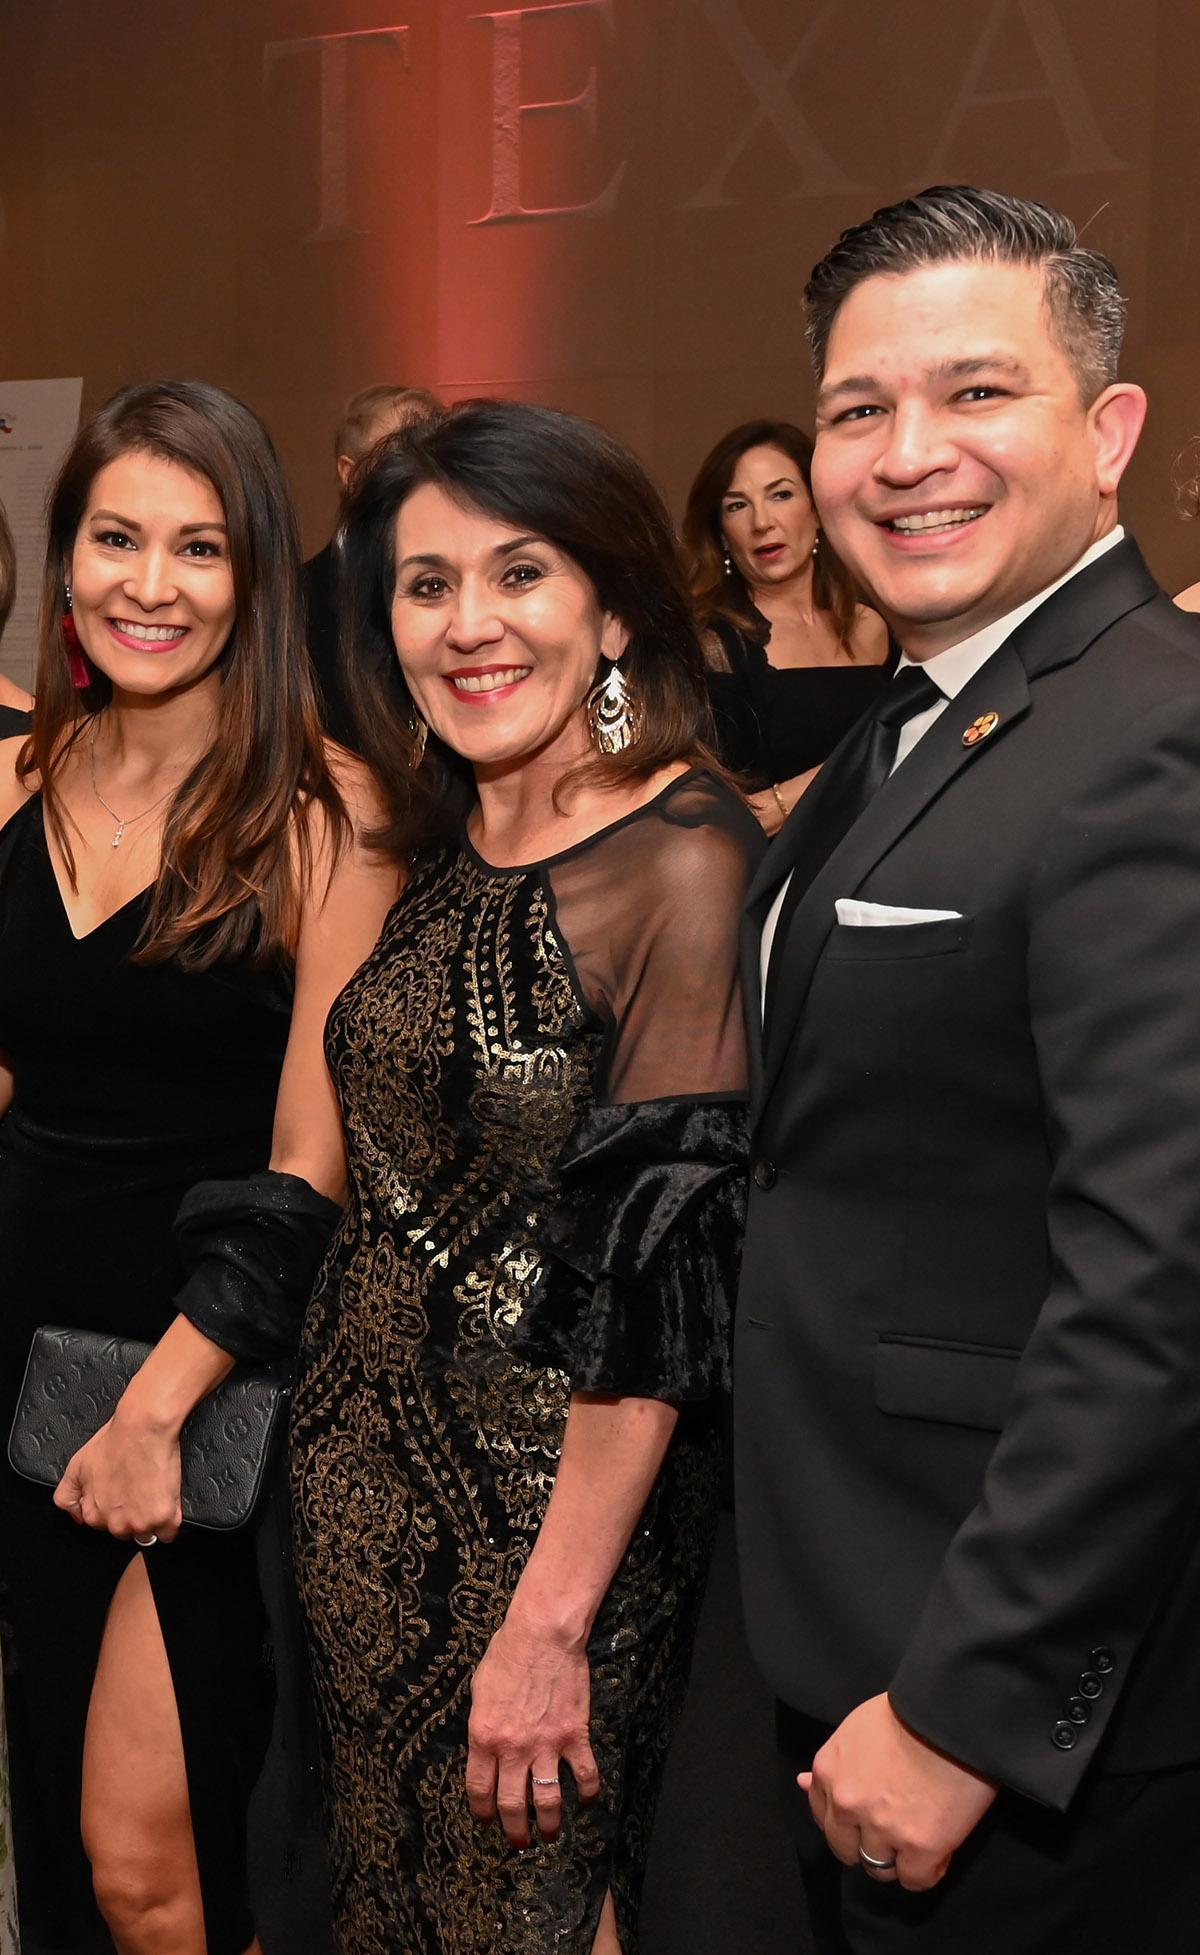 Yvonne Rodriguez, Veronica Hinojosa-Segura and Luis Rodriguez